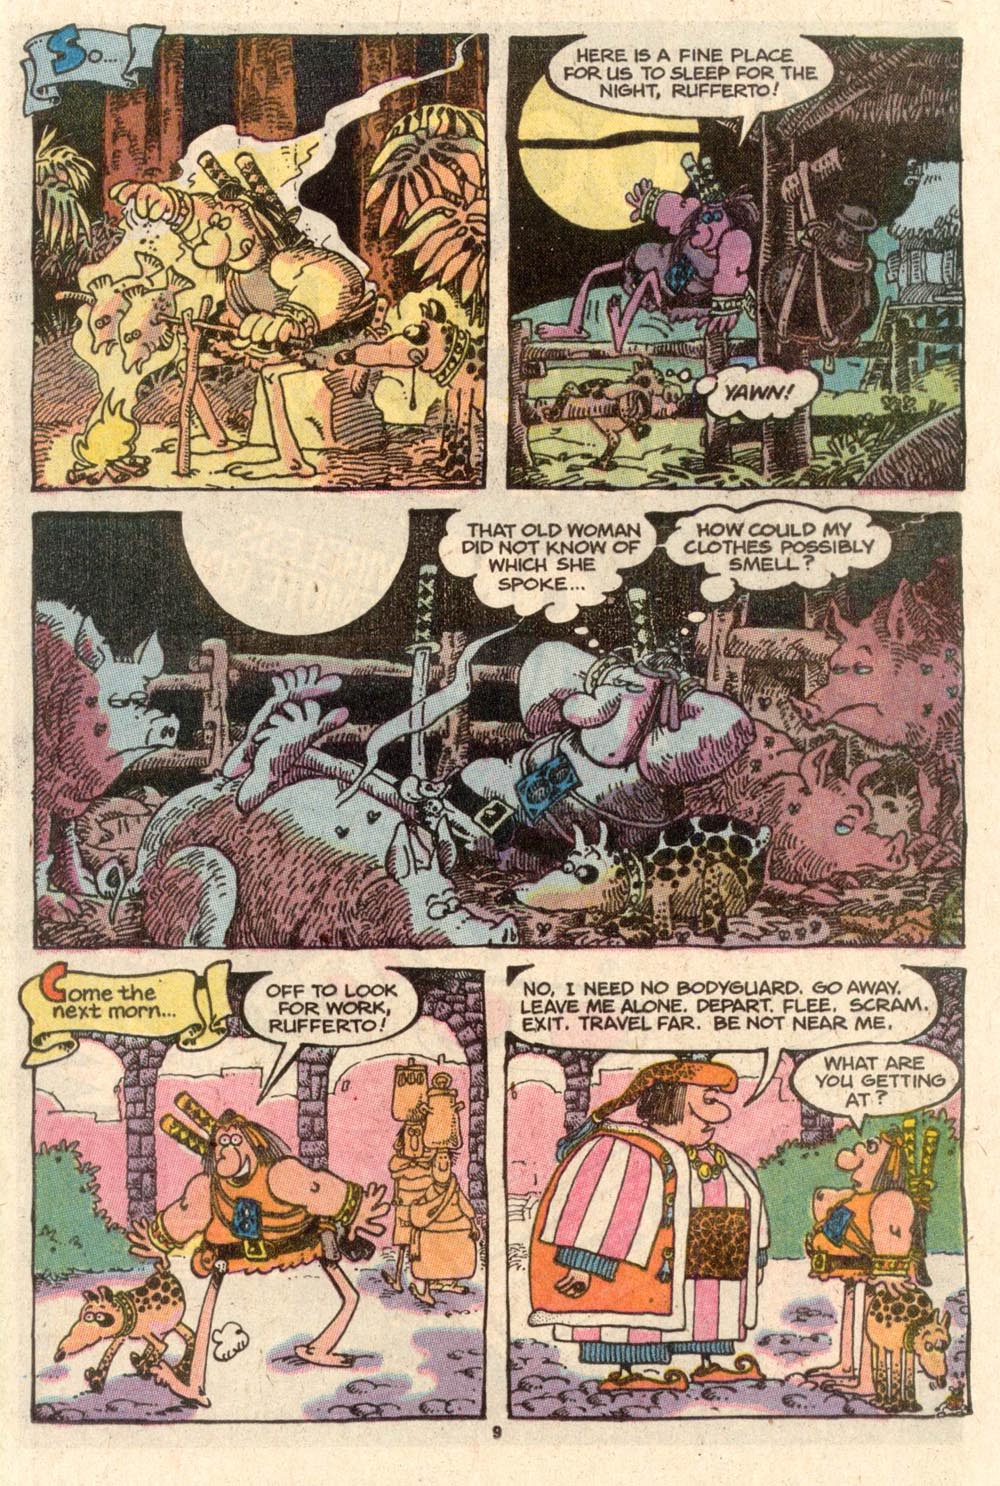 Read online Sergio Aragonés Groo the Wanderer comic -  Issue #46 - 9